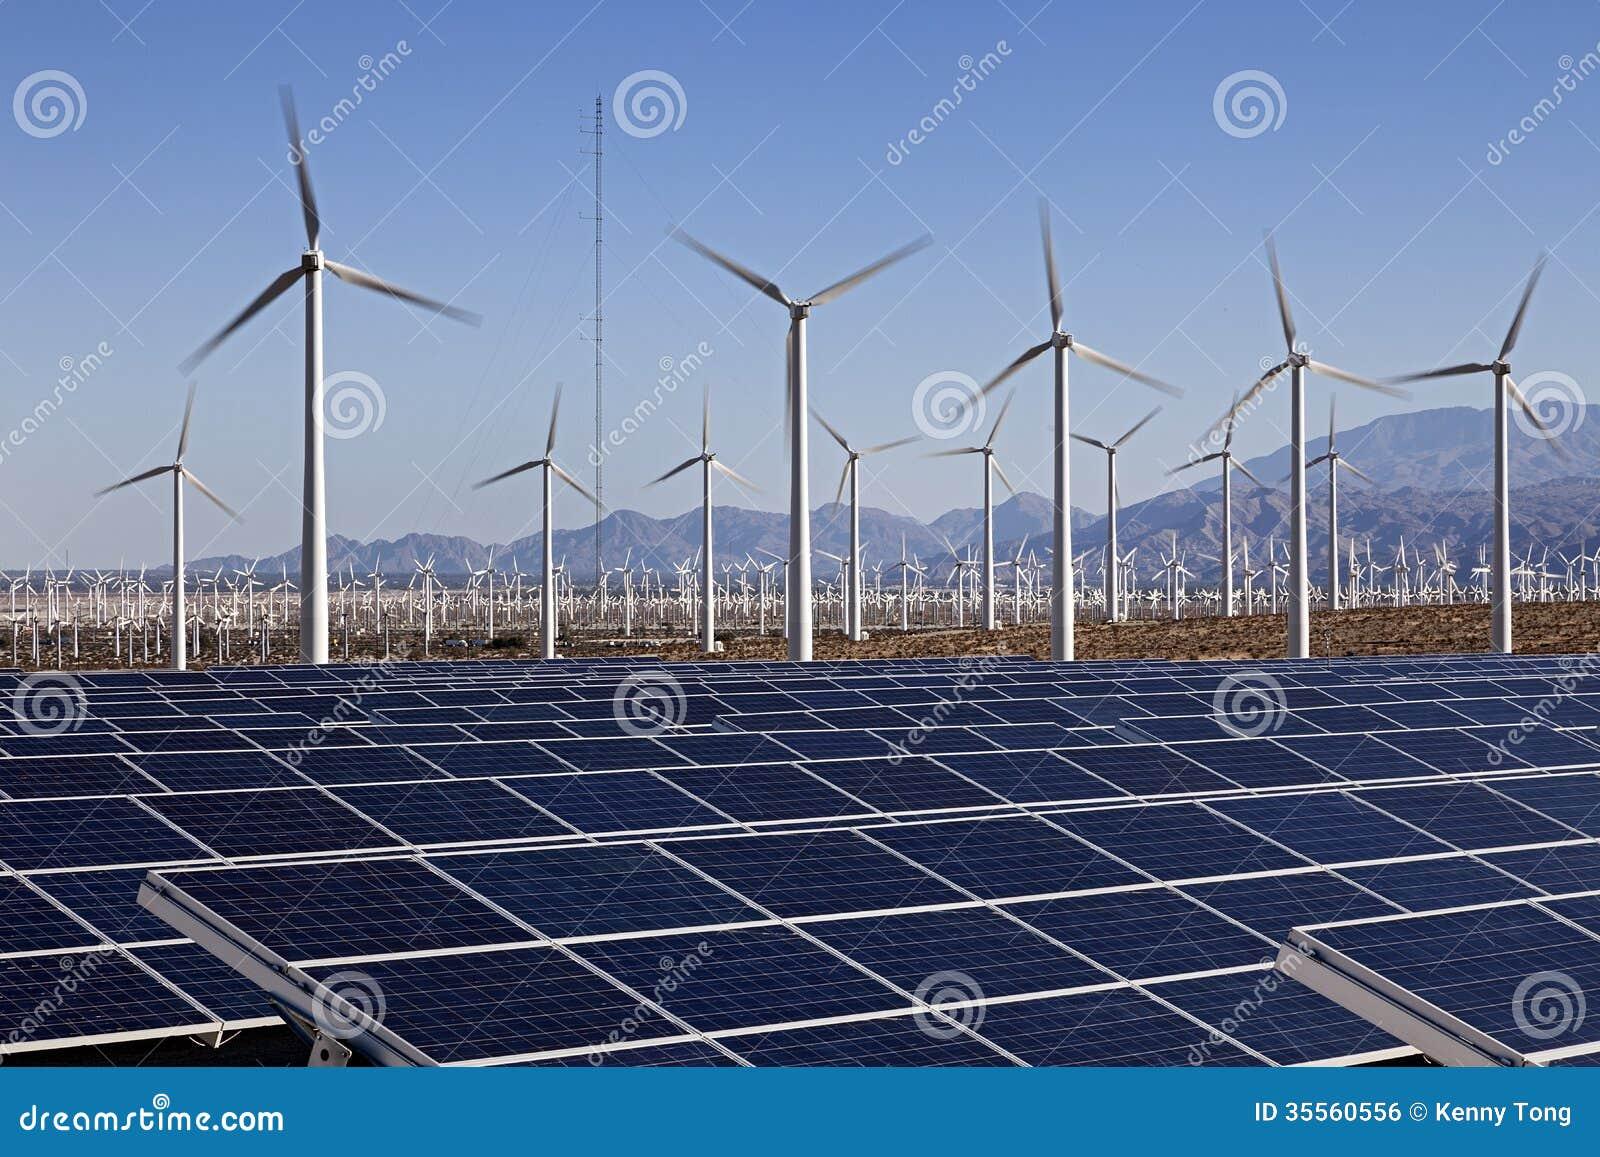 Solar Panels And Wind Turbine Power Royalty Free Stock Image - Image ...